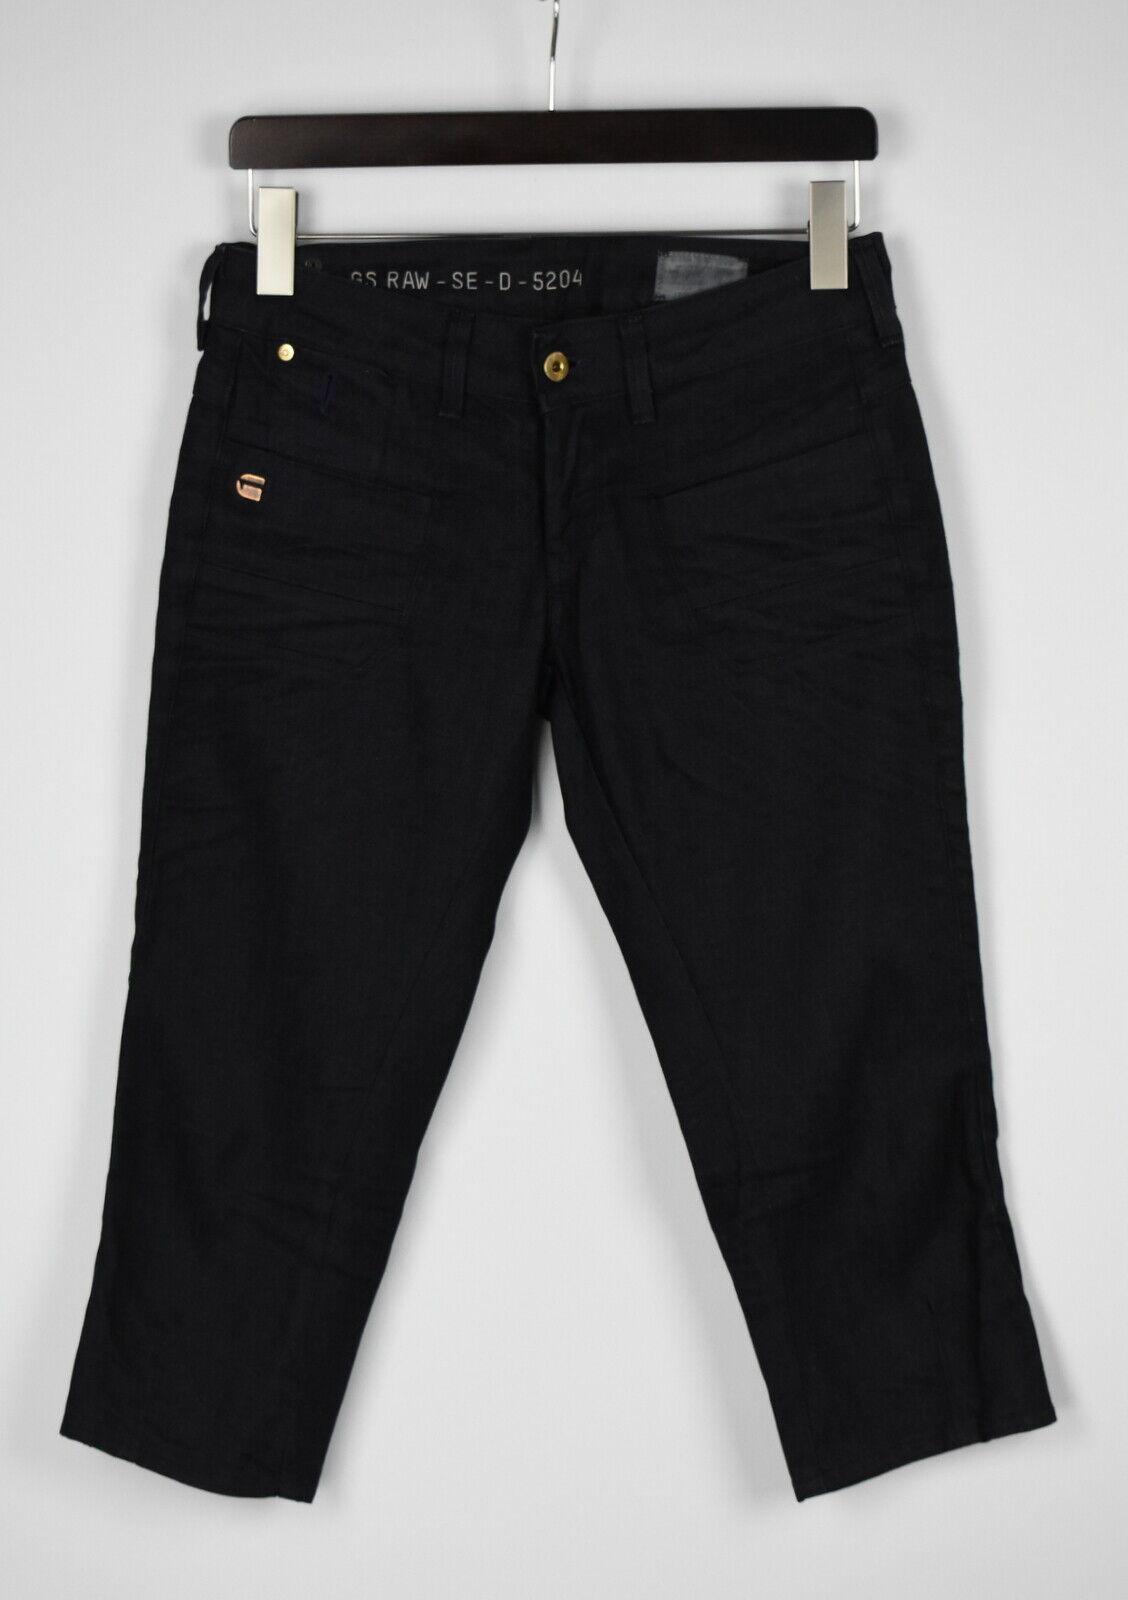 G-Star Raw Shipmate Cropped Damen W29 Dehnbar Dunkelblau Denim Shorts 27825_ Js